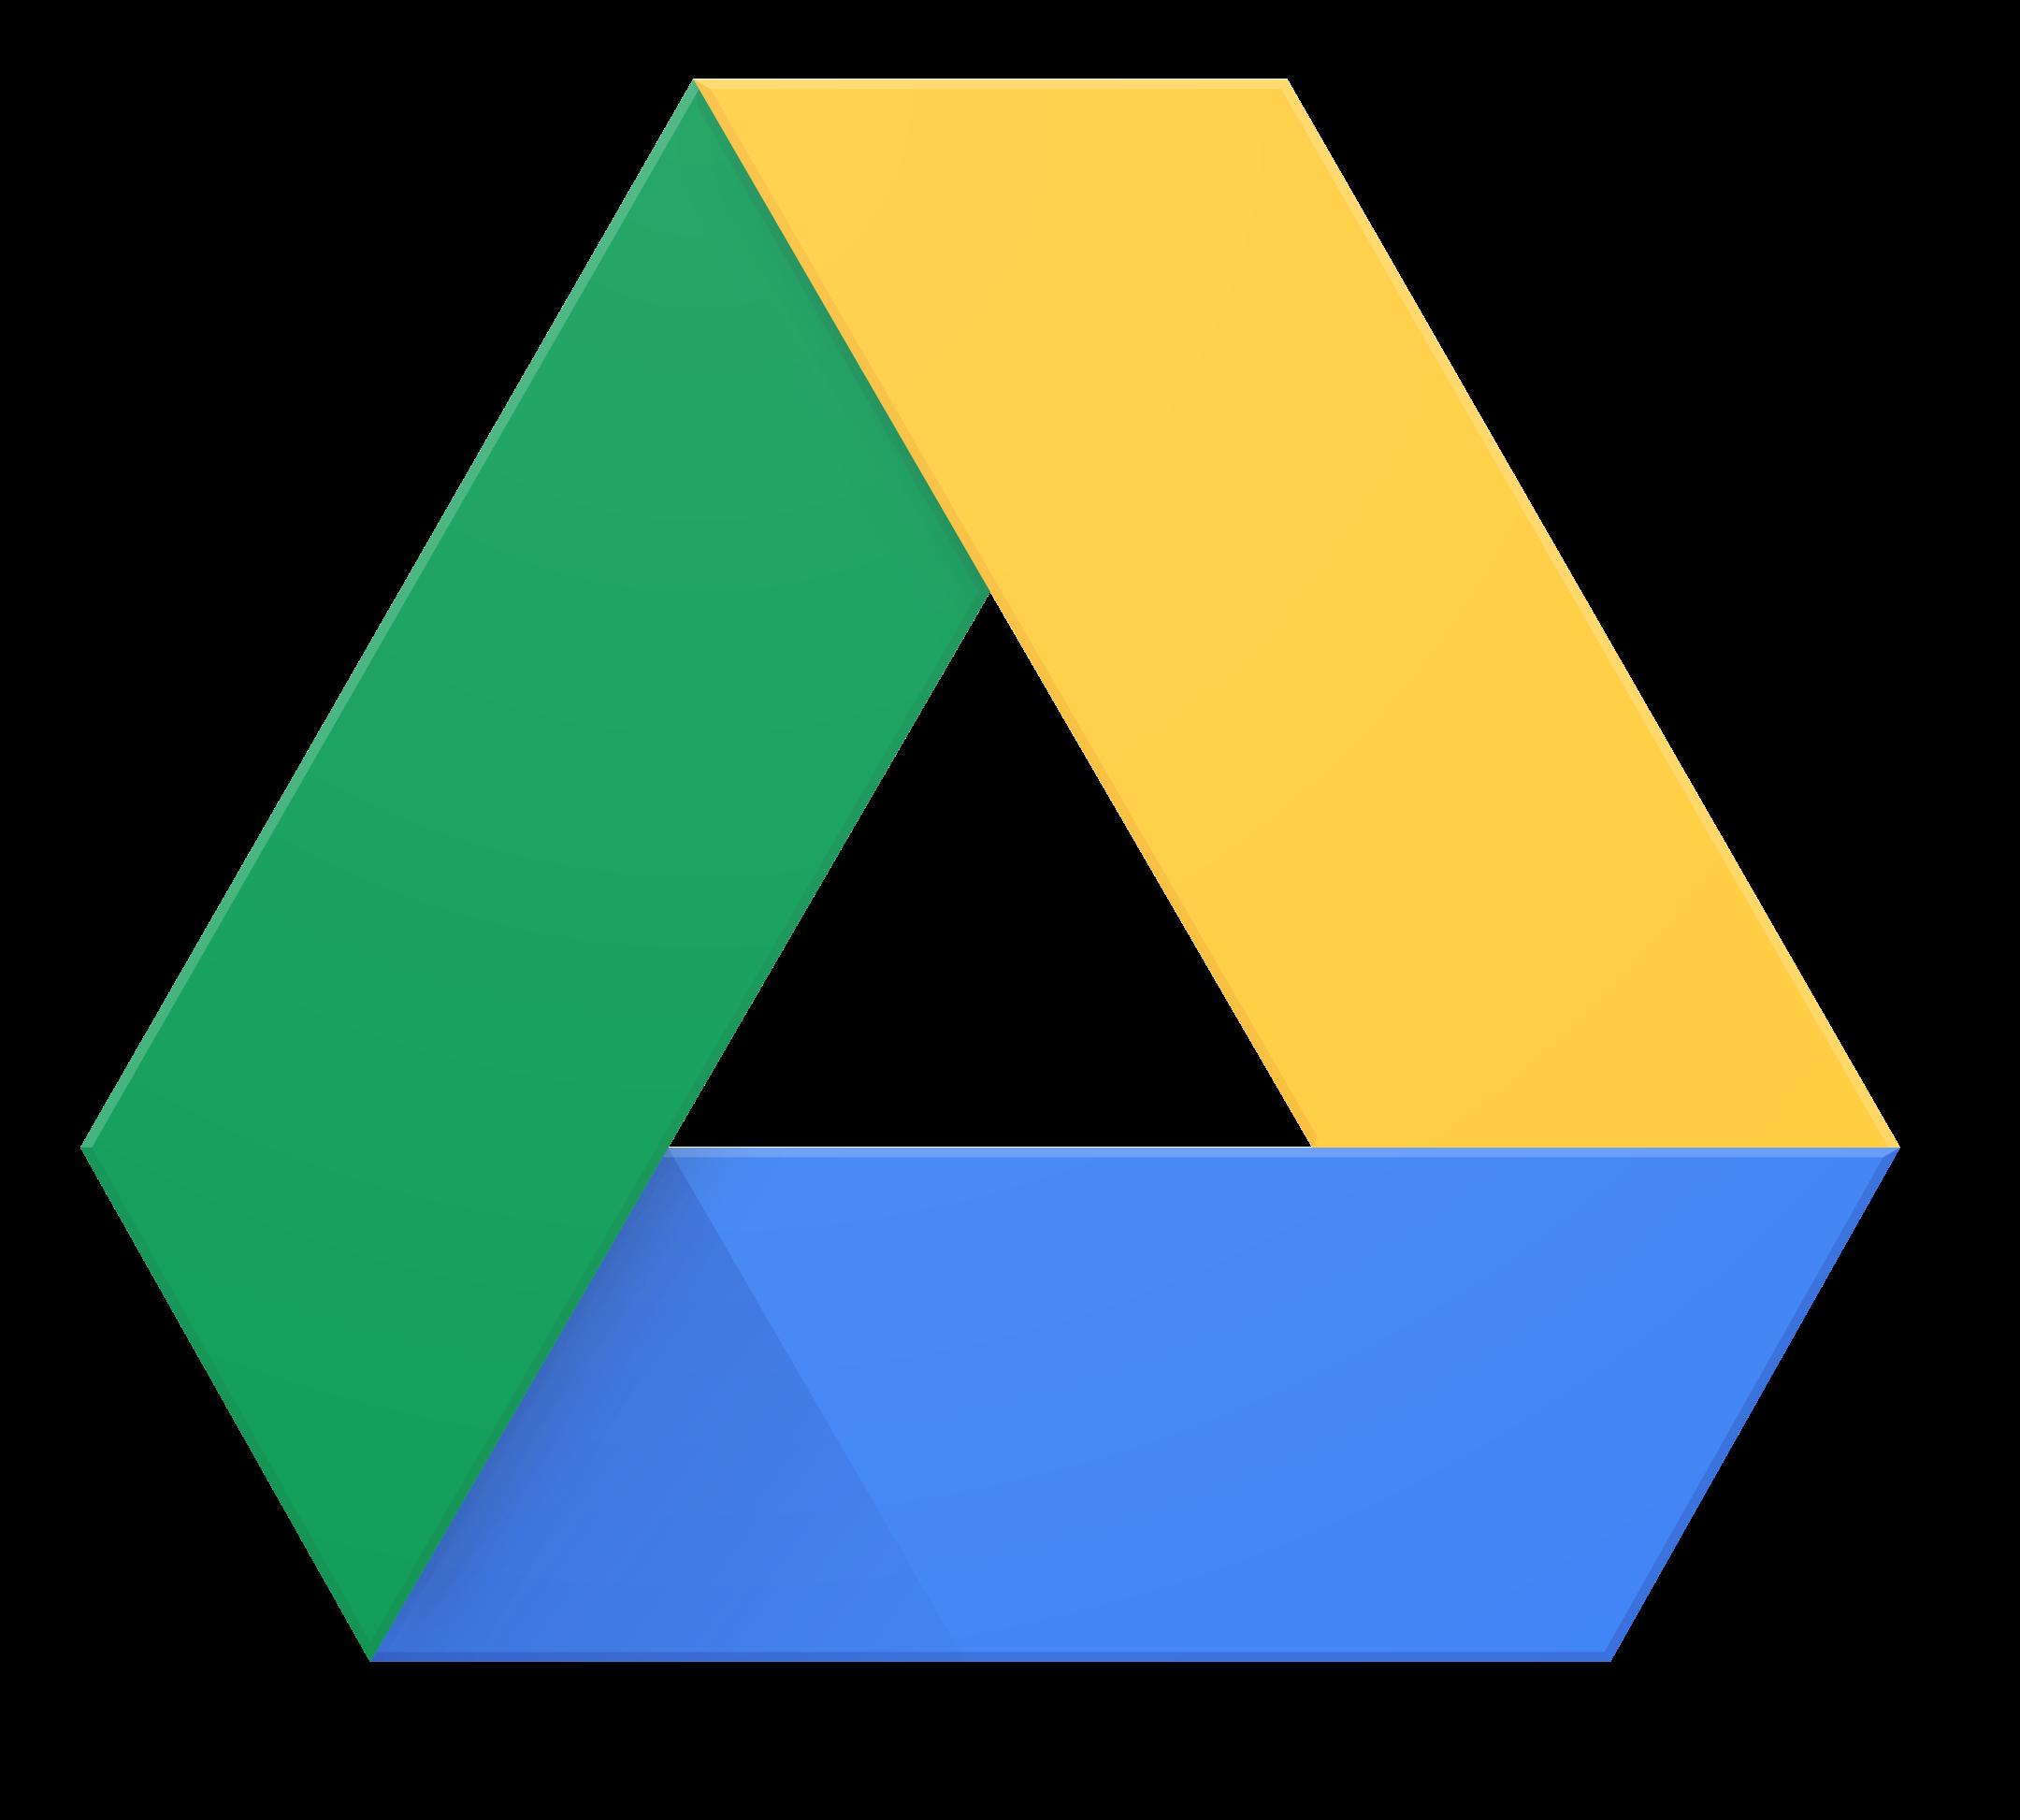 google drive logo 7 - Google Drive Logo